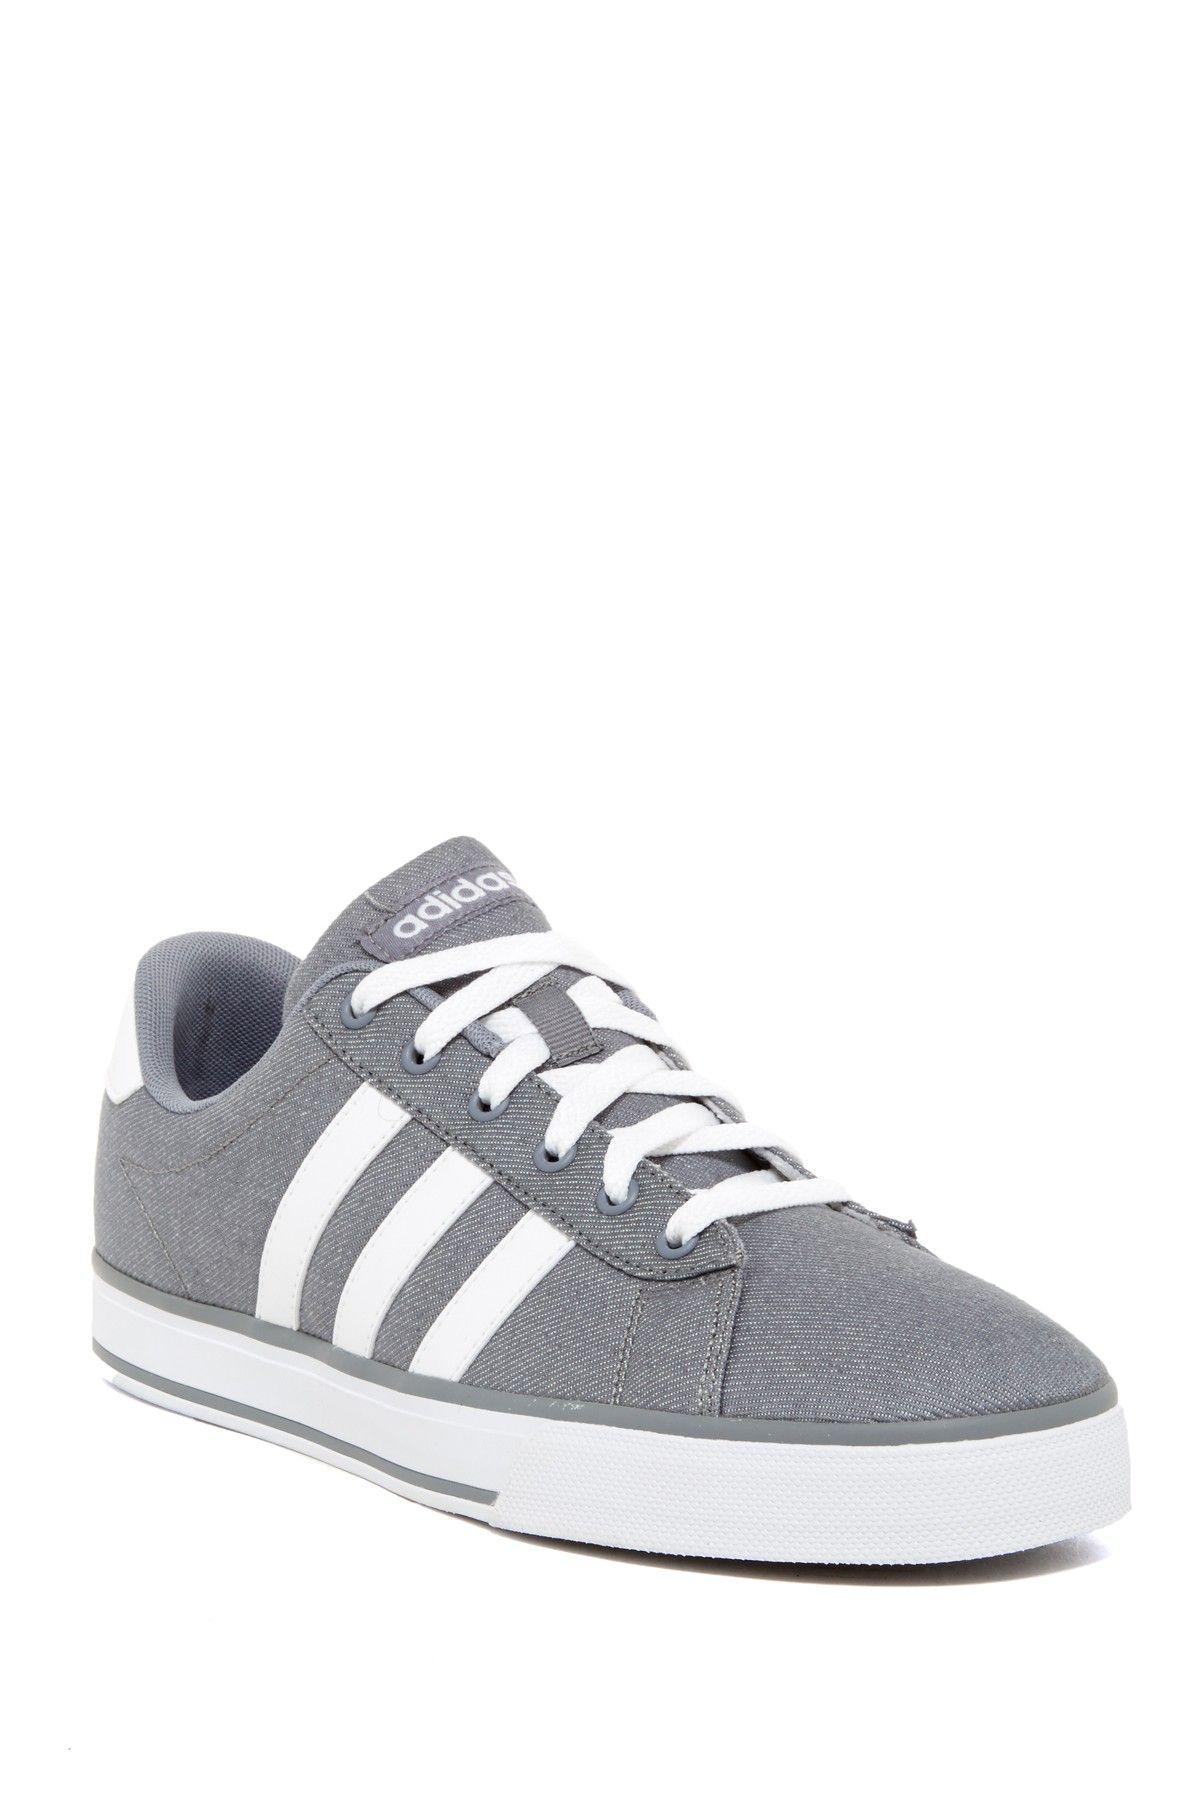 Daily Vulc Sneaker   Sneakers, Adidas, Adidas samba sneakers